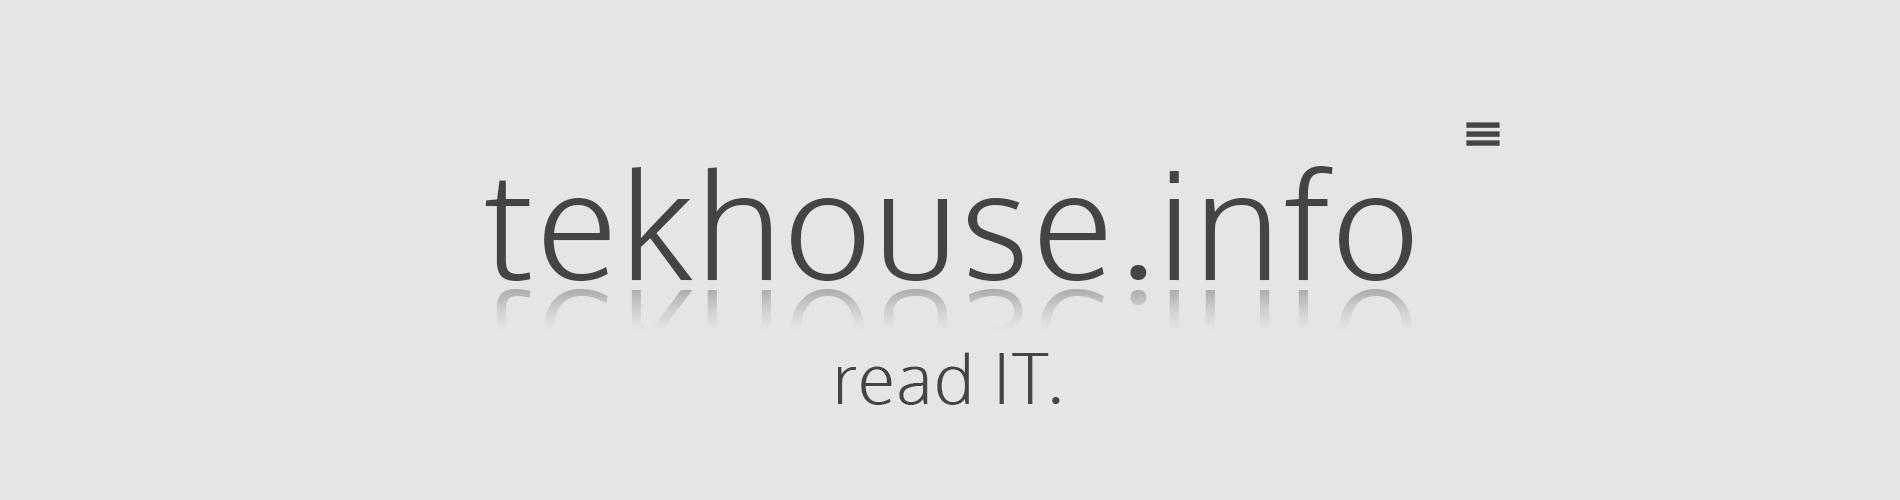 tekhouse.info (@tekhouseinfo) Cover Image